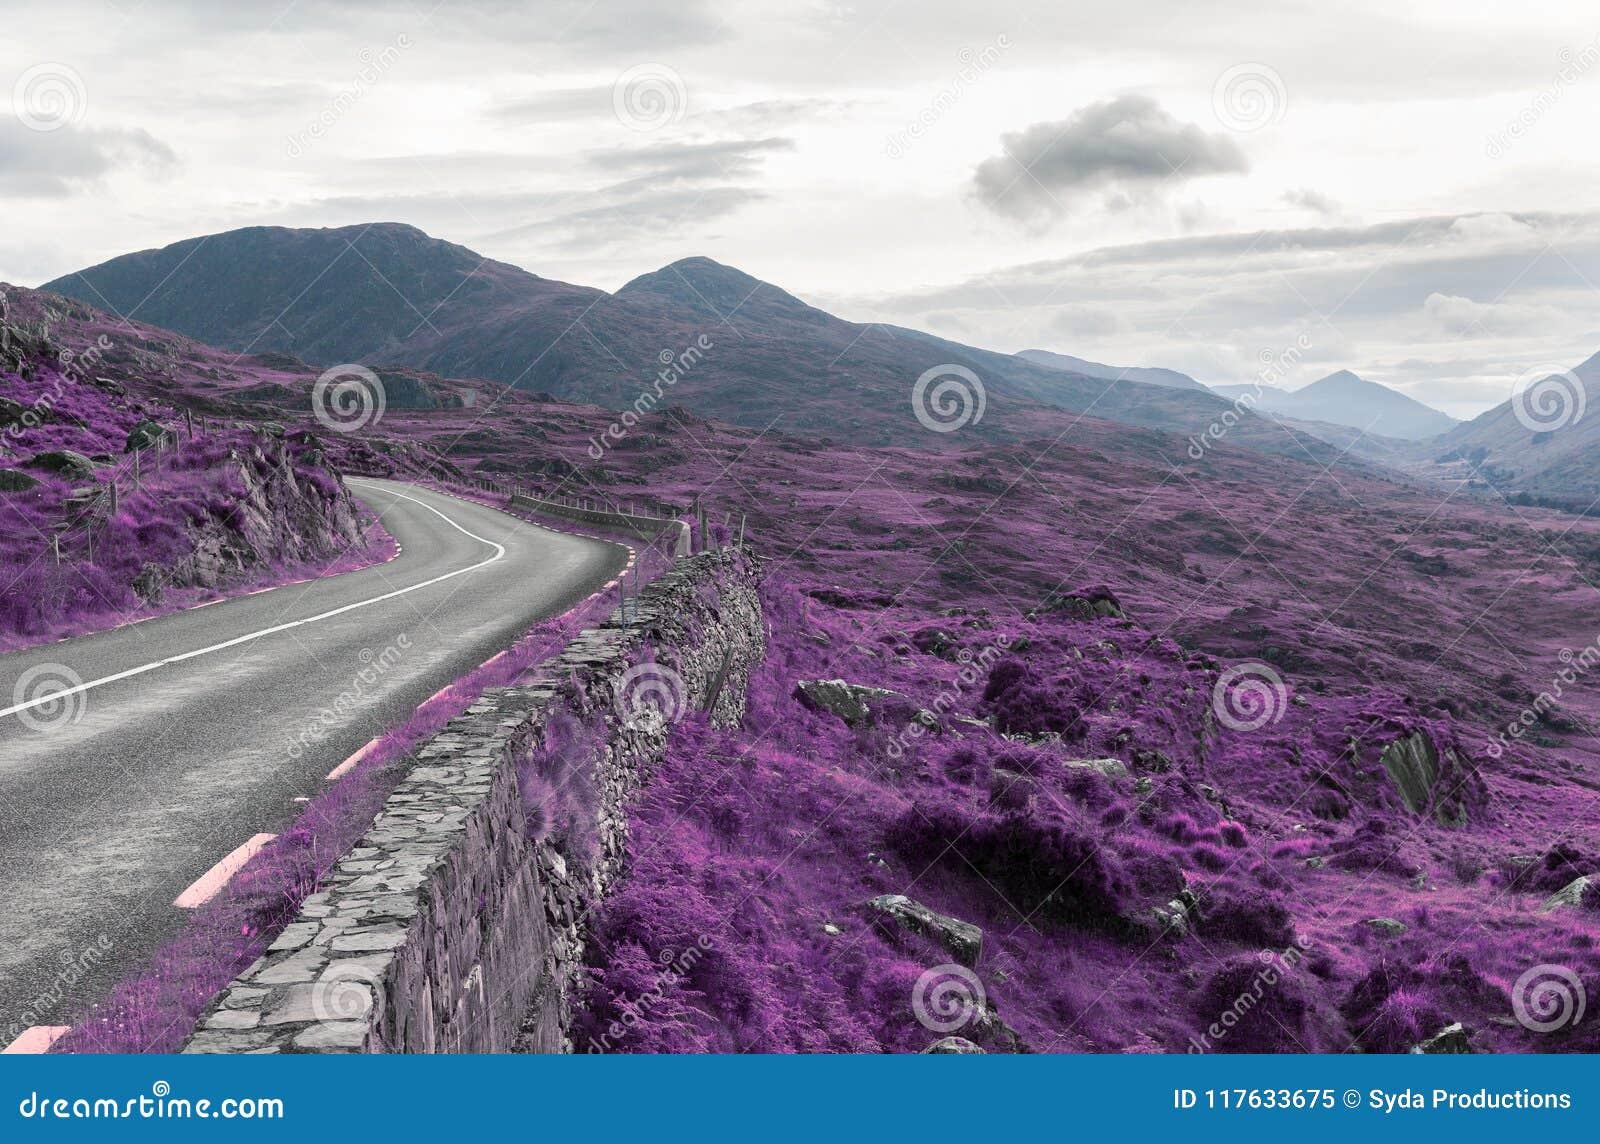 Asphalt road and hills at connemara in ireland